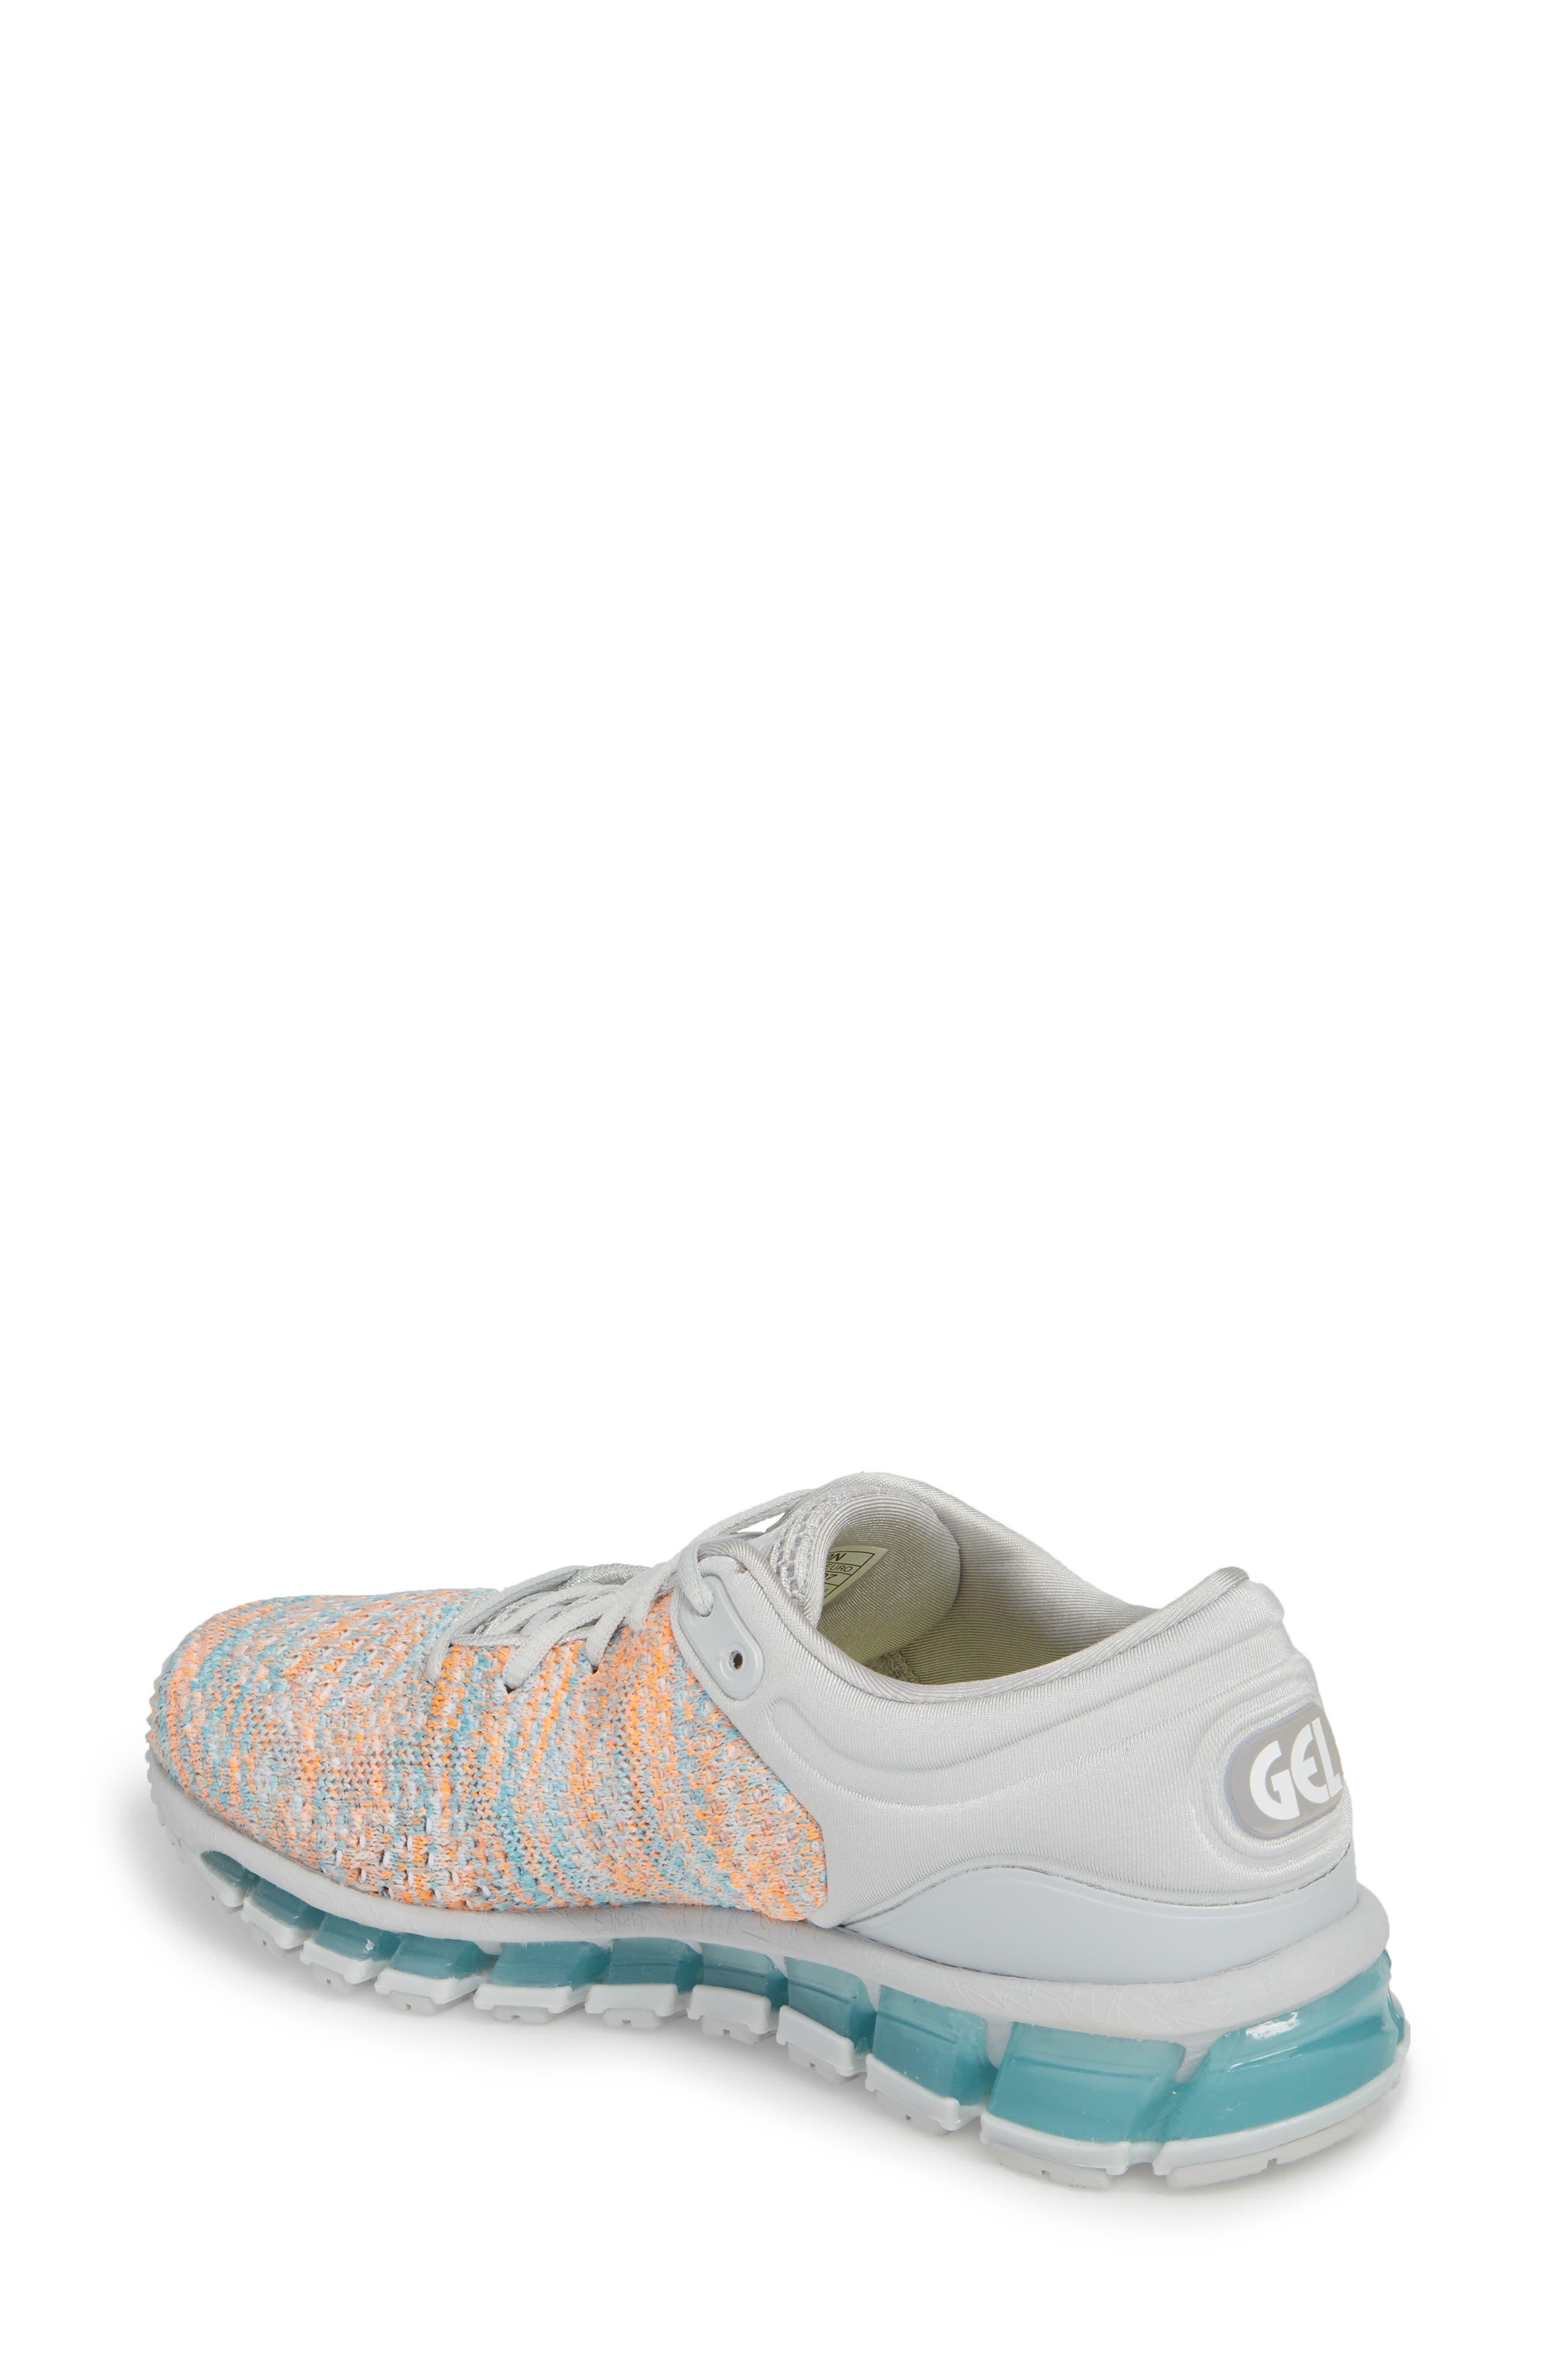 GEL-Quantum 360 Running Shoe,                             Alternate thumbnail 2, color,                             GLACIER GREY/ ORANGE POP/ BLUE